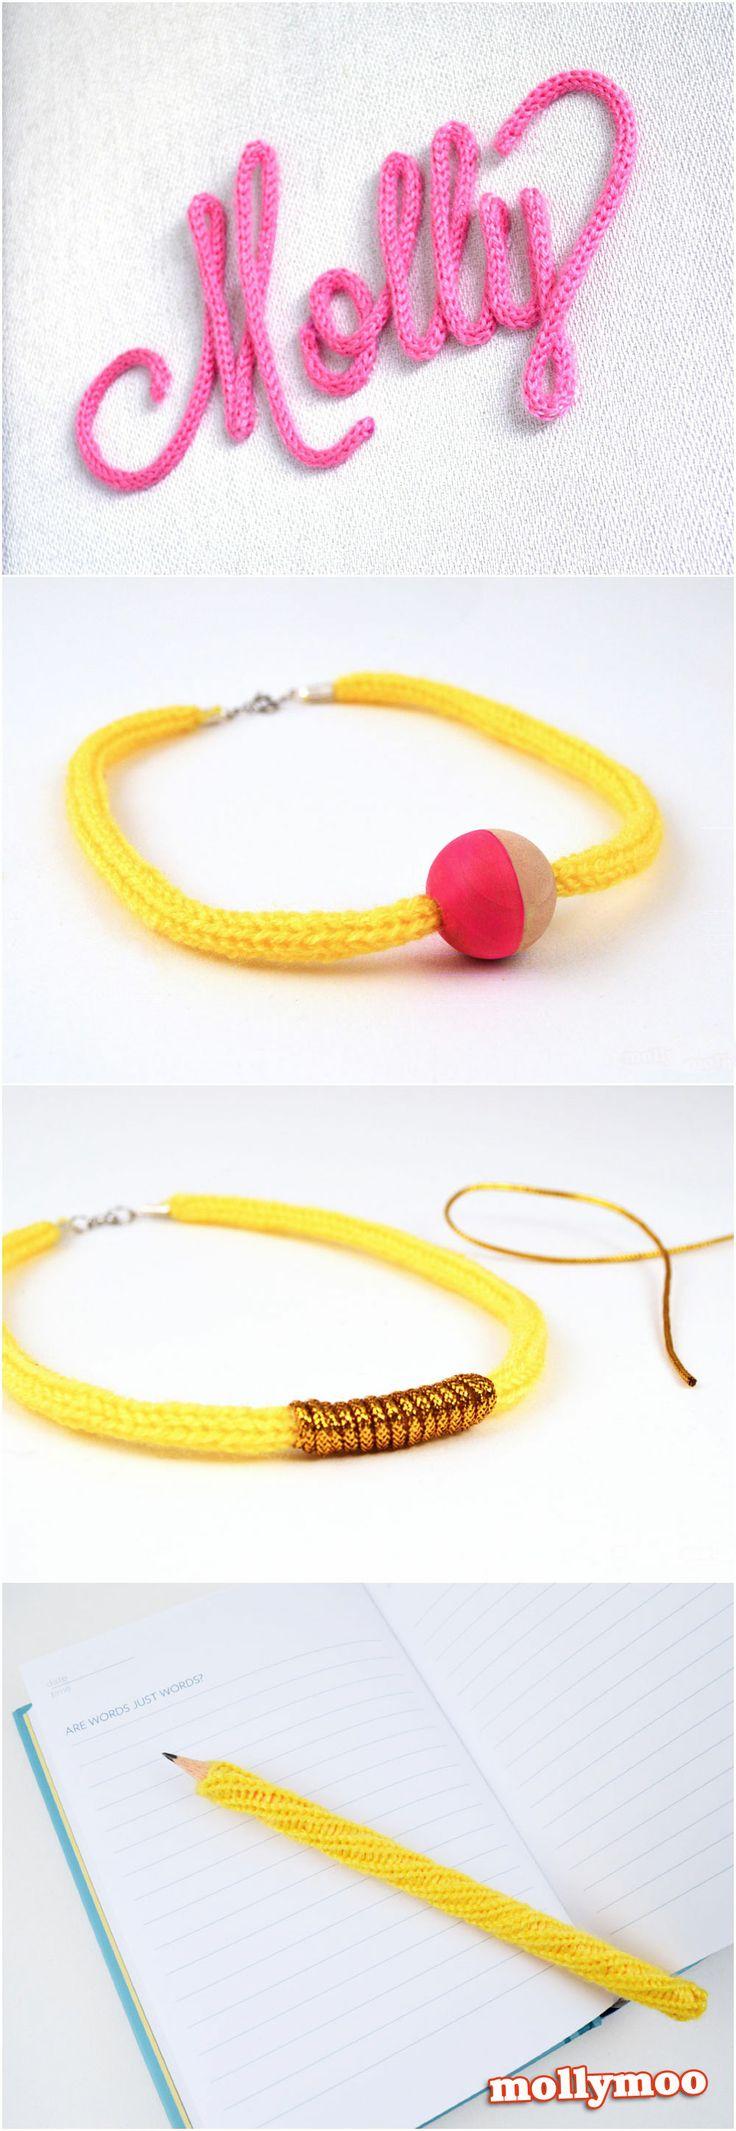 4 French Knitting / iCord craft ideas | MollyMooCrafts.com